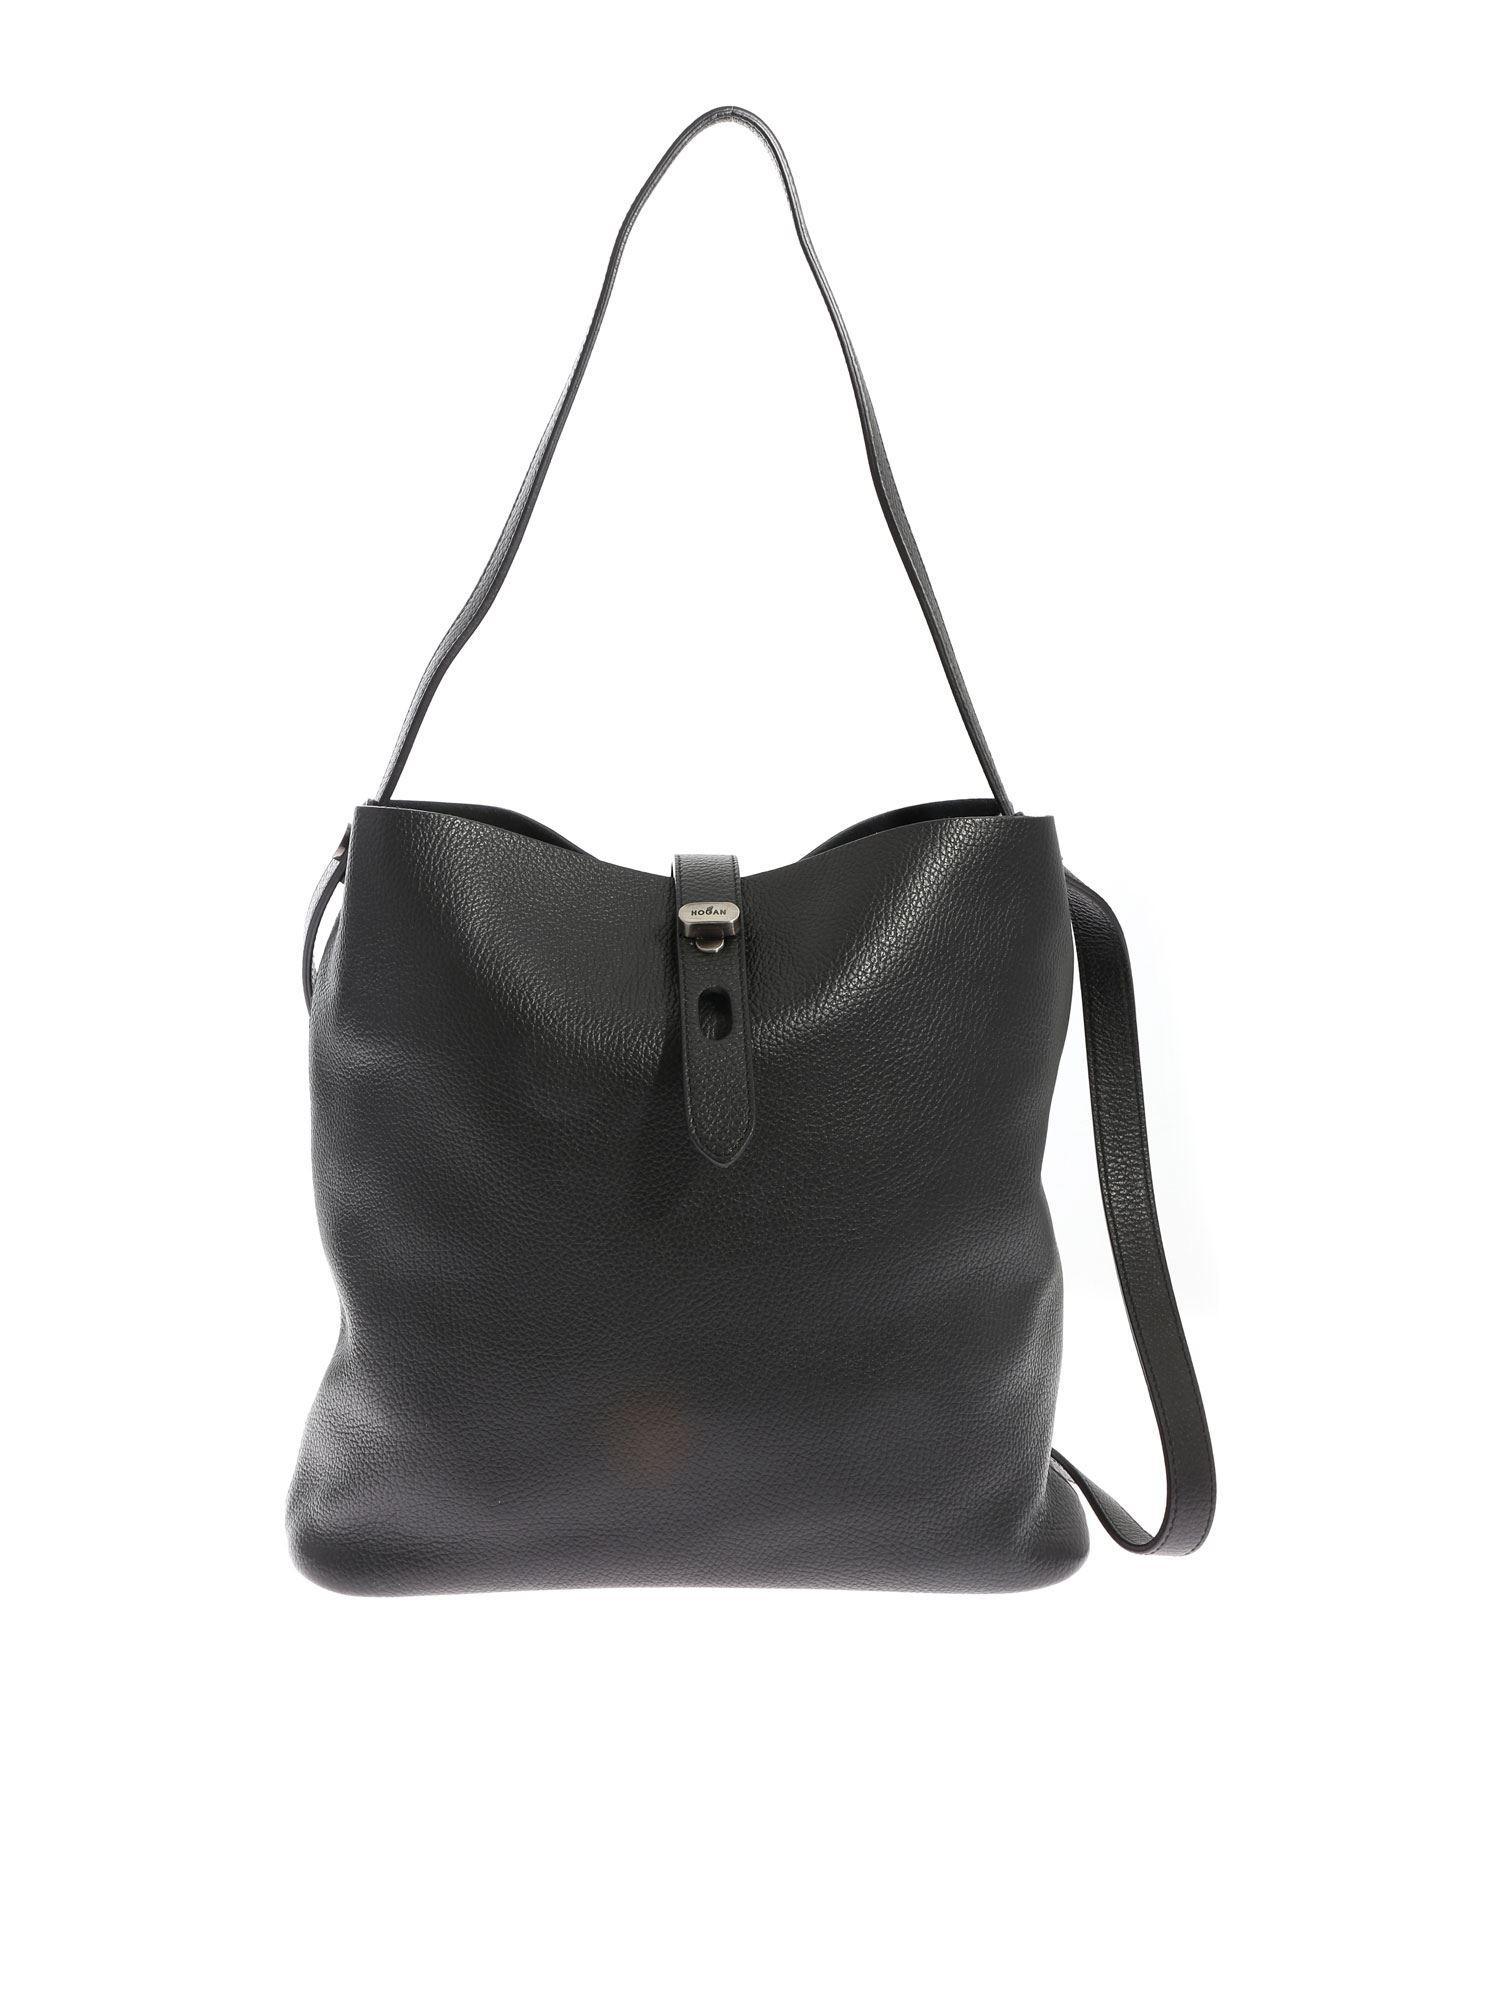 Hogan Leather